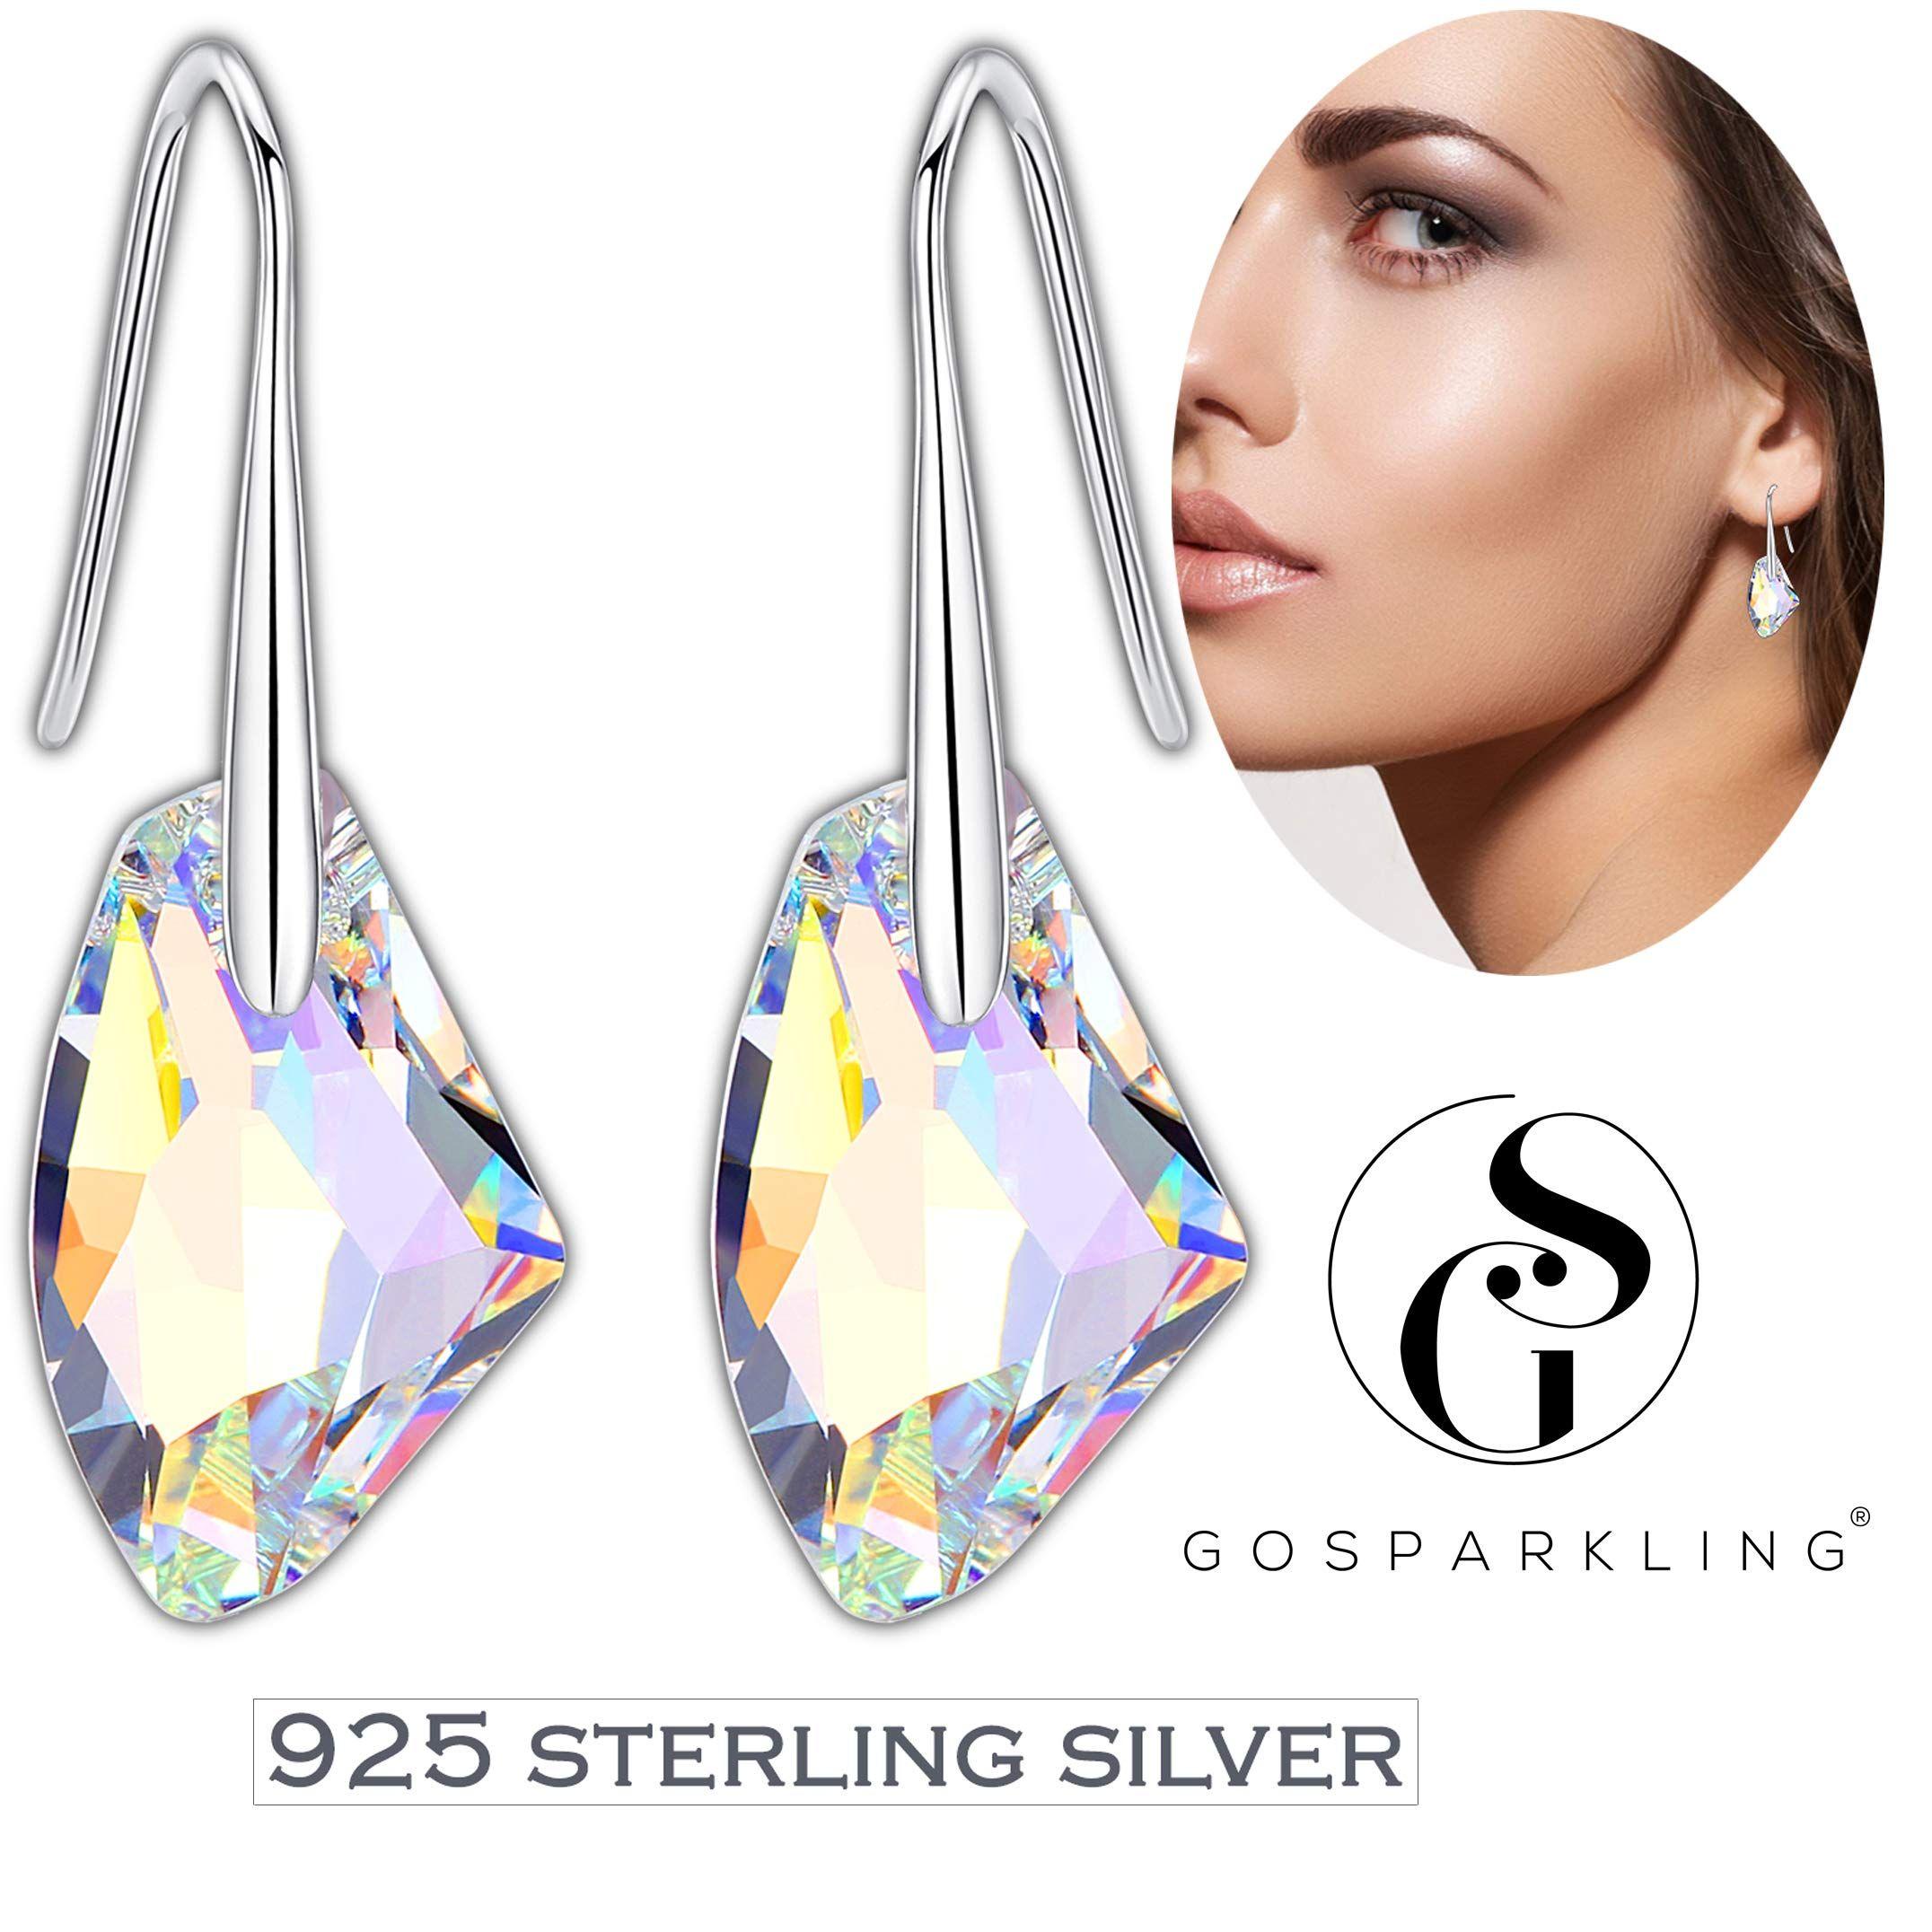 For Her Christmas Gift Ideas Gemstone Earrings Mother/'s Day. Petite Earrings Sterling Silver Lever Backs Citrine Drop Earrings